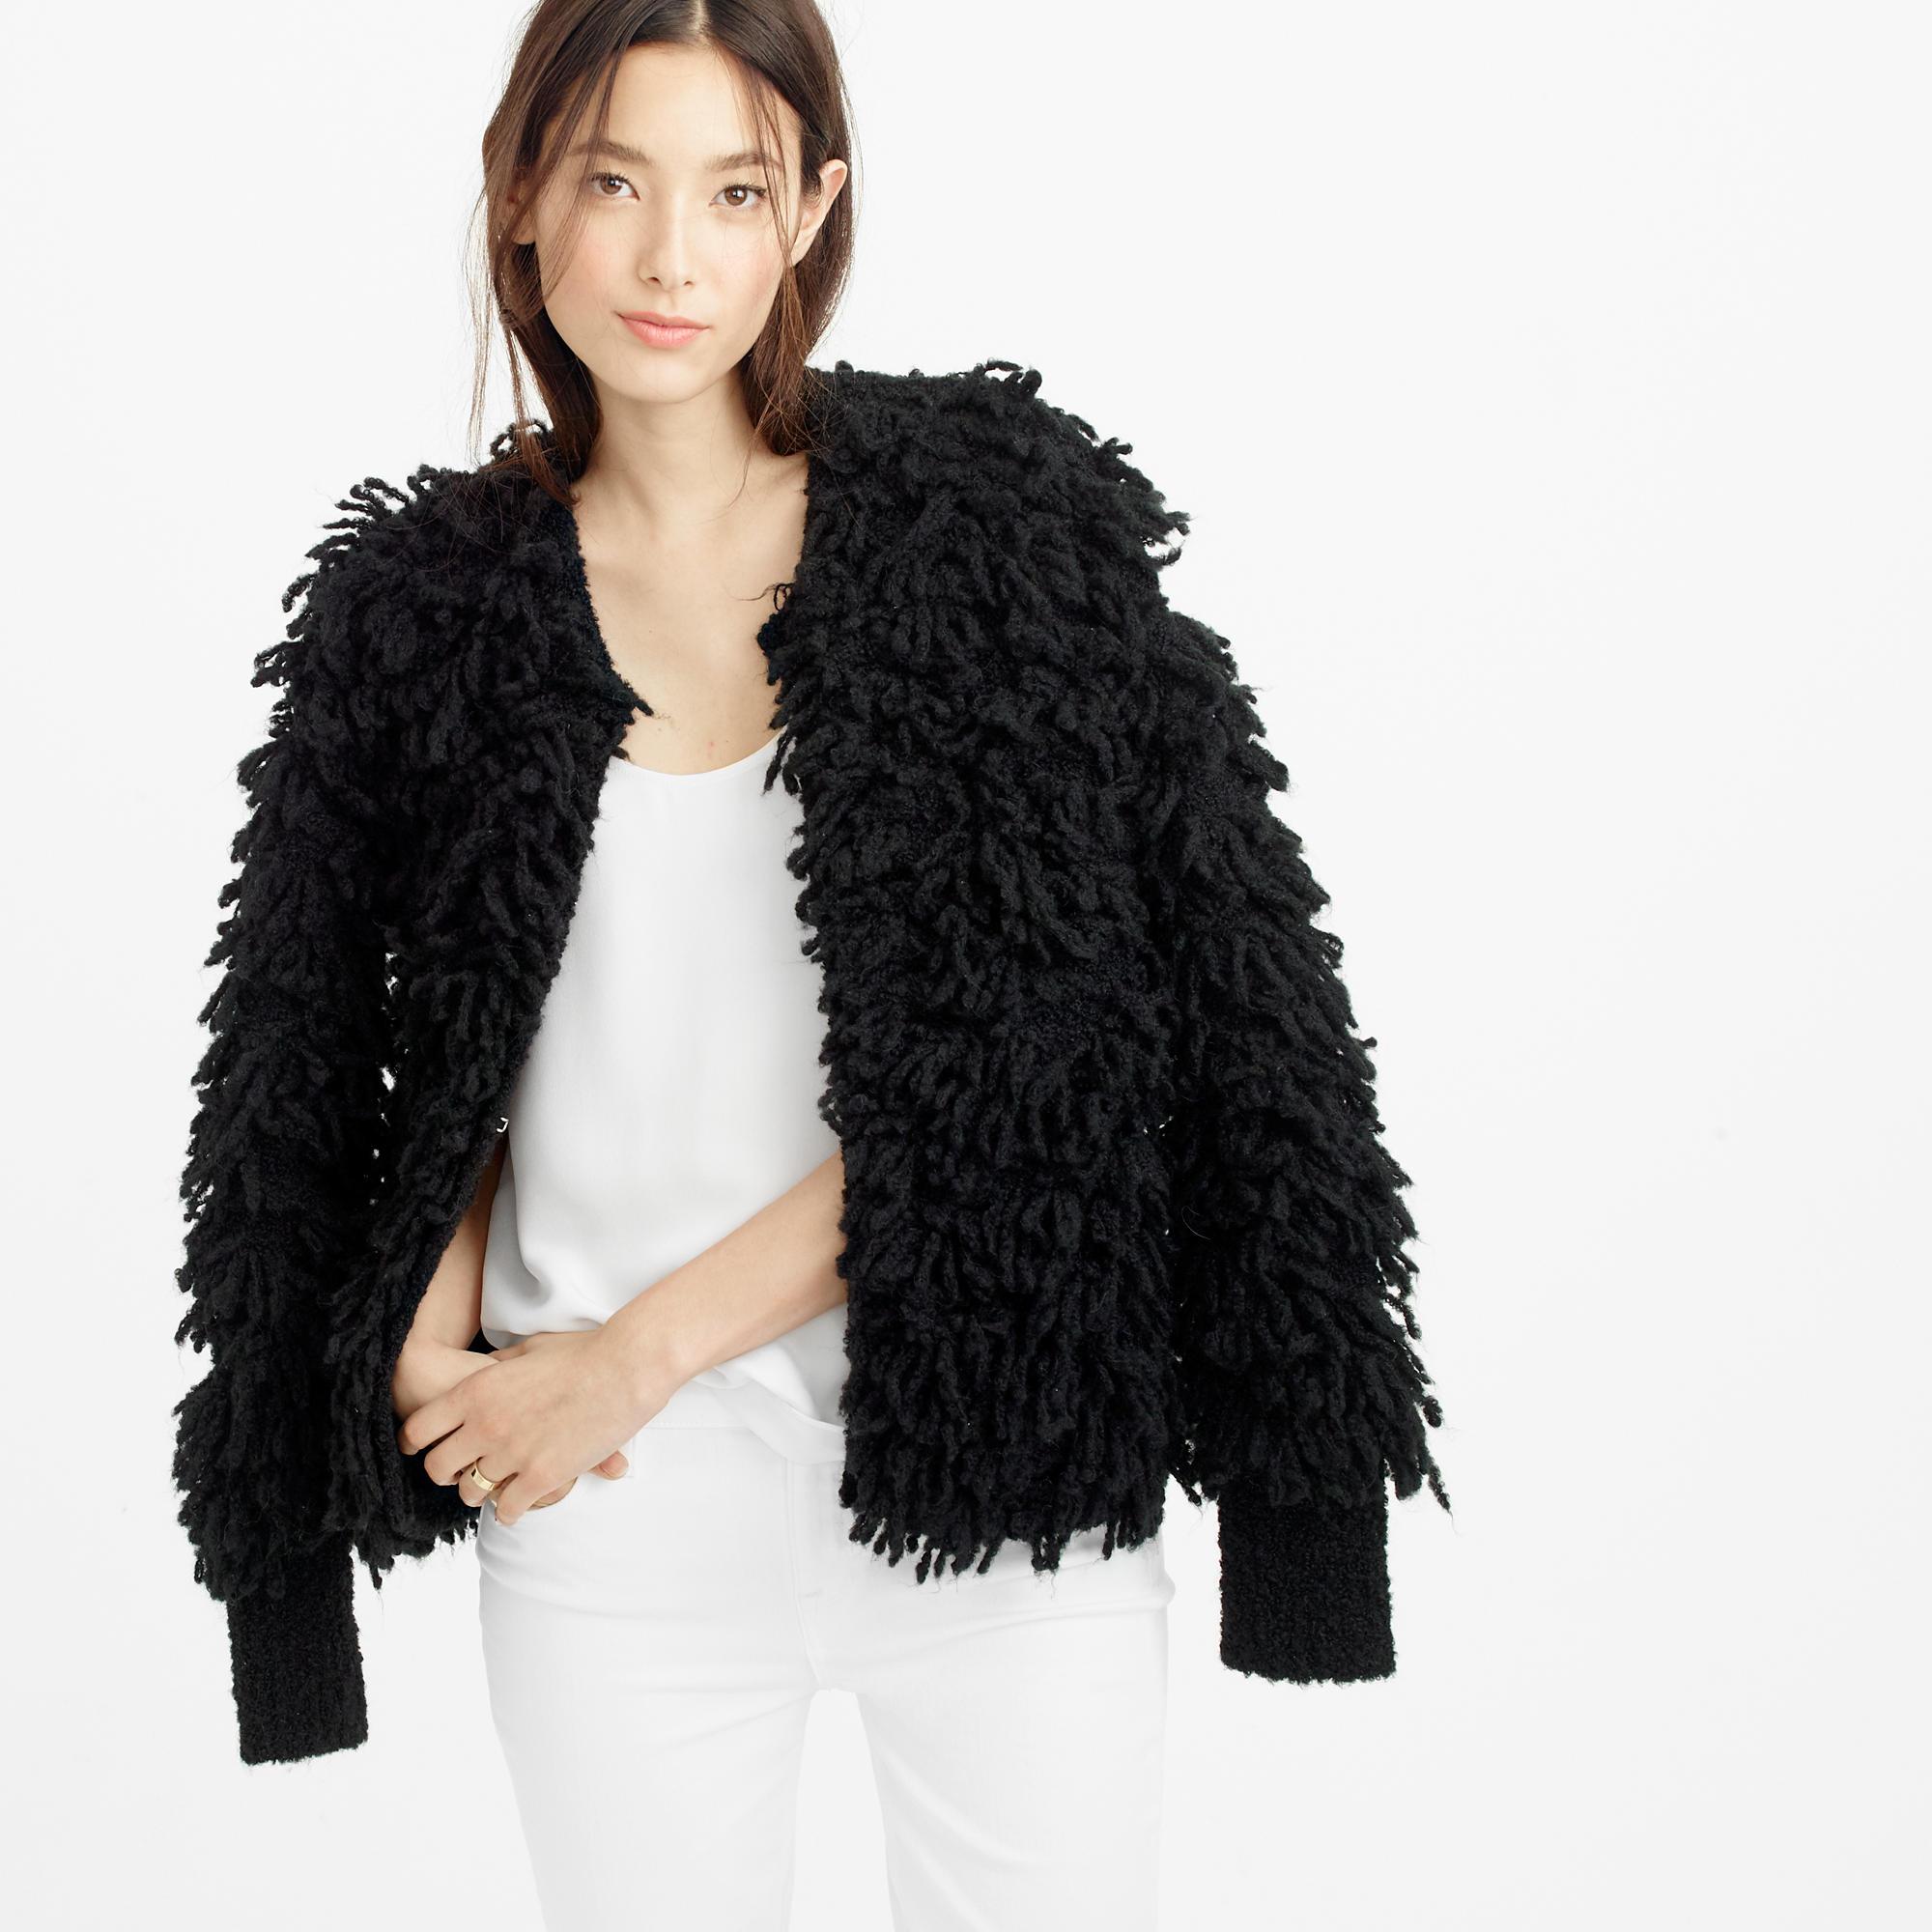 Collection bouclé sweater-jacket : Women Cardigans &amp Shells | J.Crew